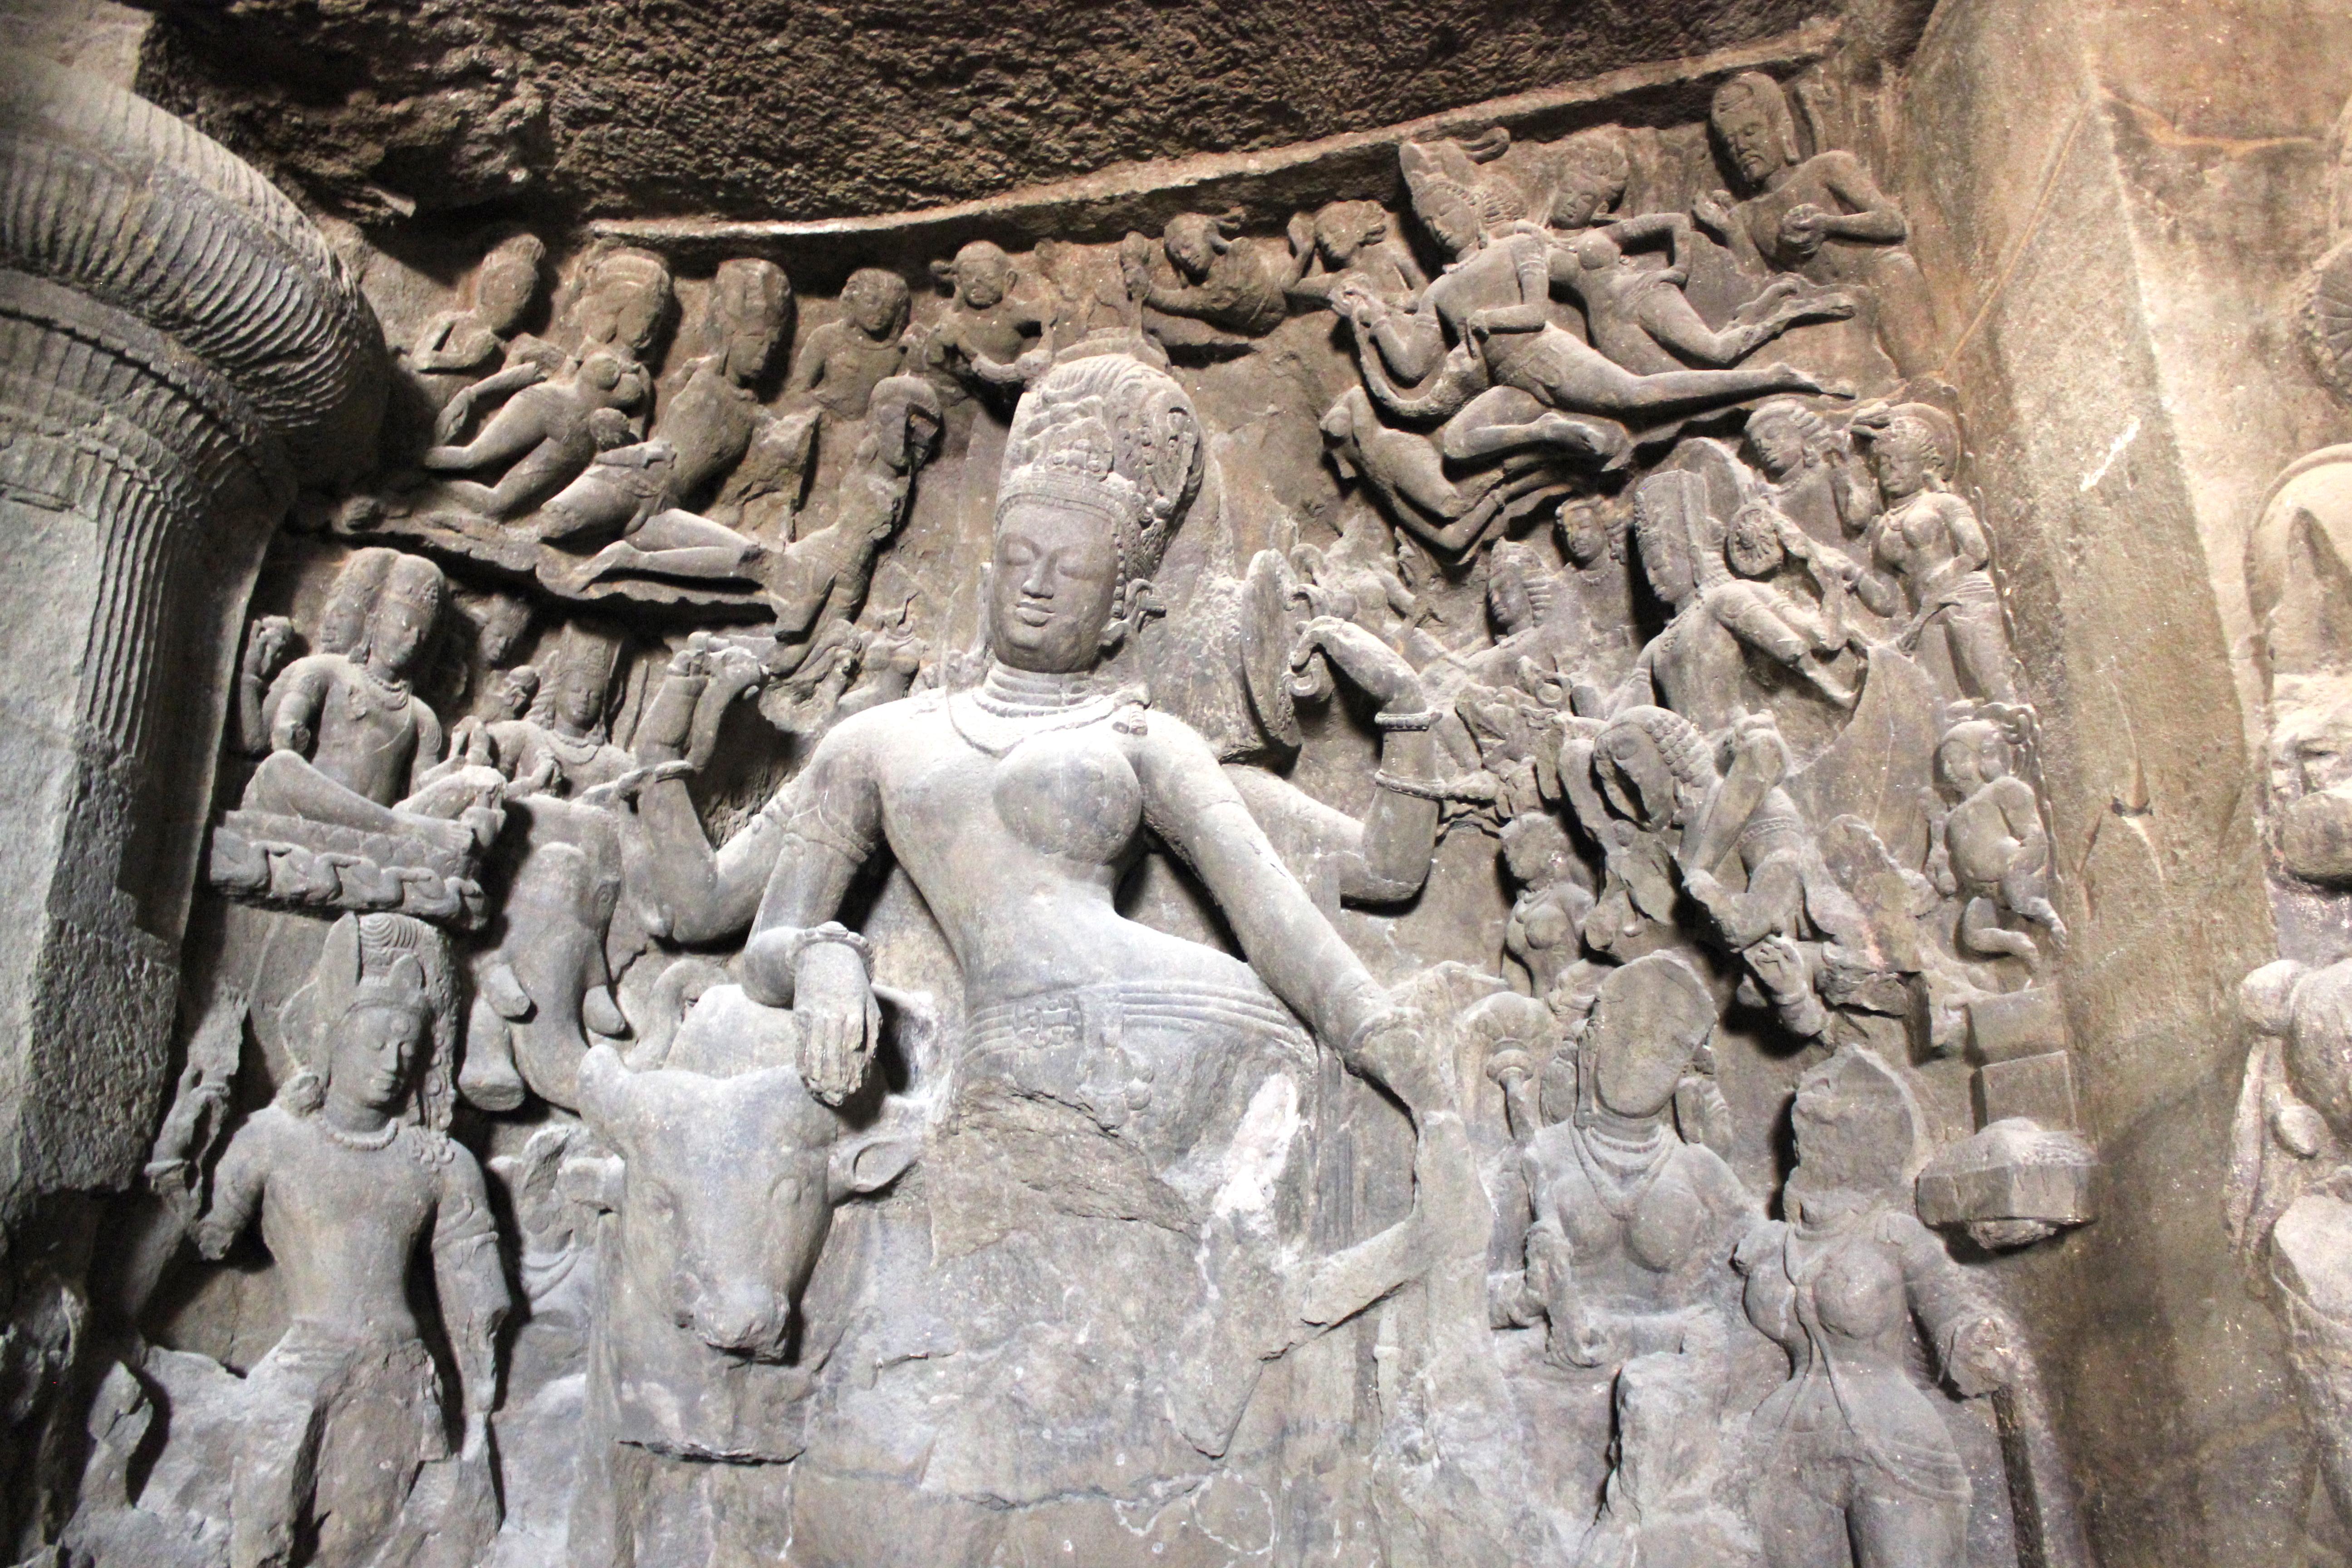 https://upload.wikimedia.org/wikipedia/commons/c/ca/Ardhanarishvara_half_Shiva_half_Parvati%2C_Elephanta_Caves.jpg